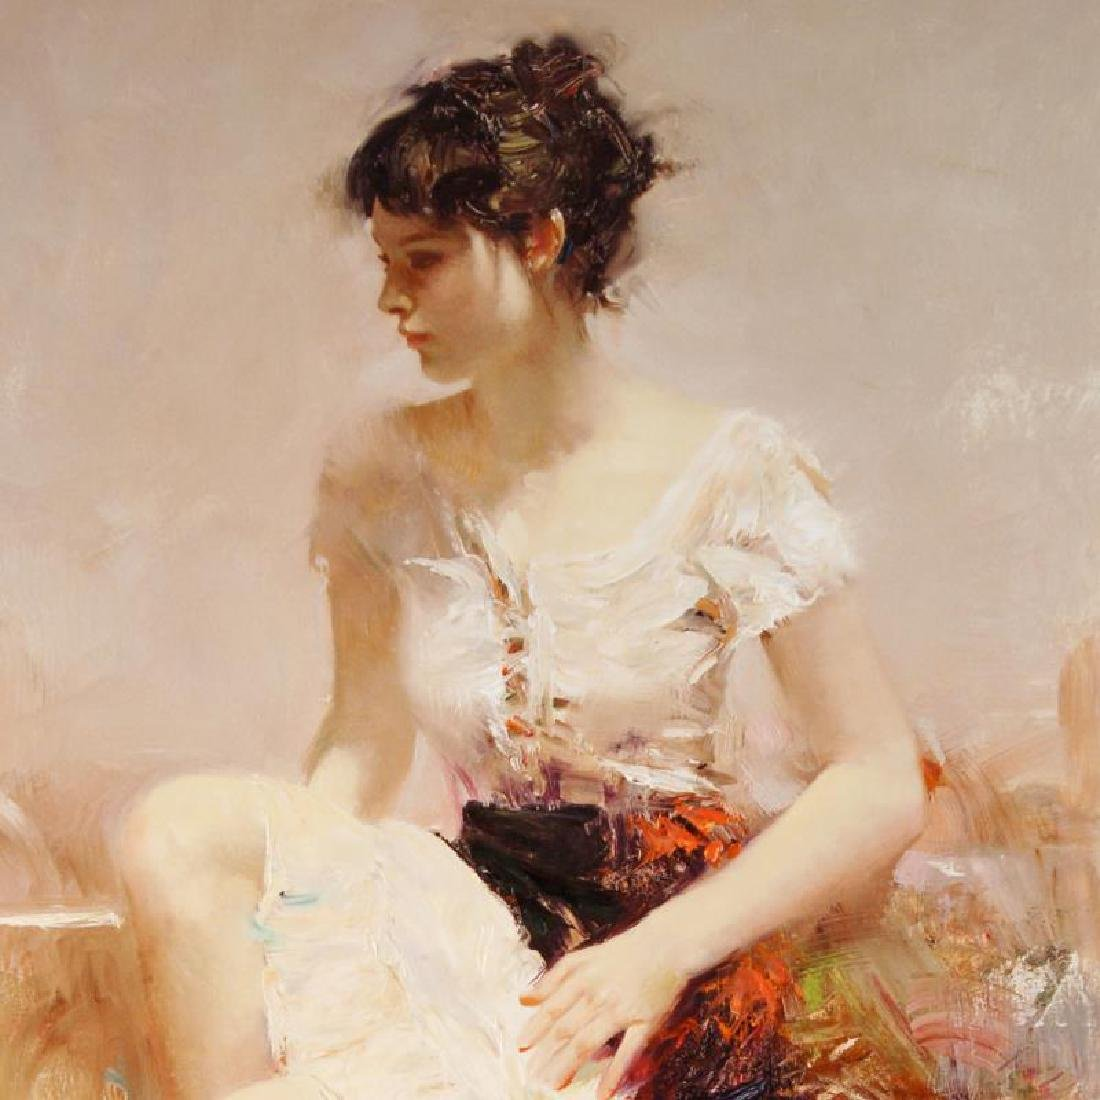 White Lace by Pino (1939-2010) - 2